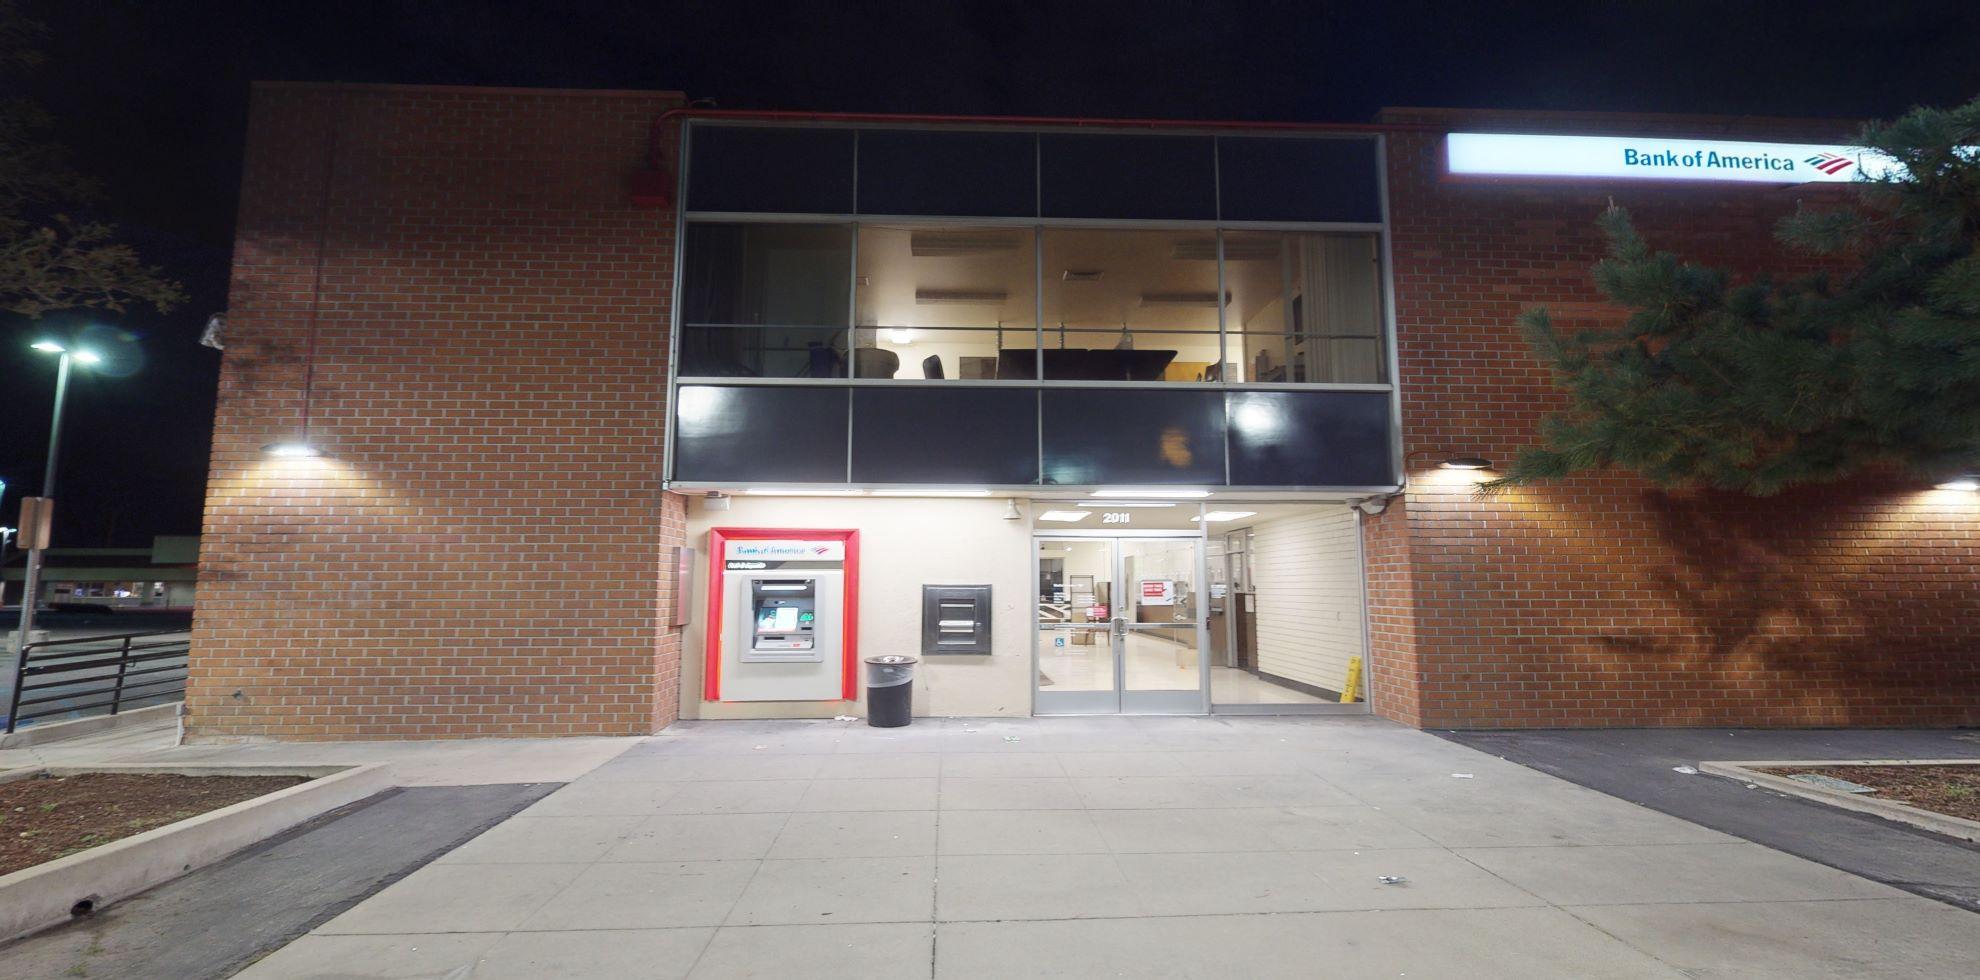 Bank of America financial center with walk-up ATM   2011 E Highland Ave, San Bernardino, CA 92404